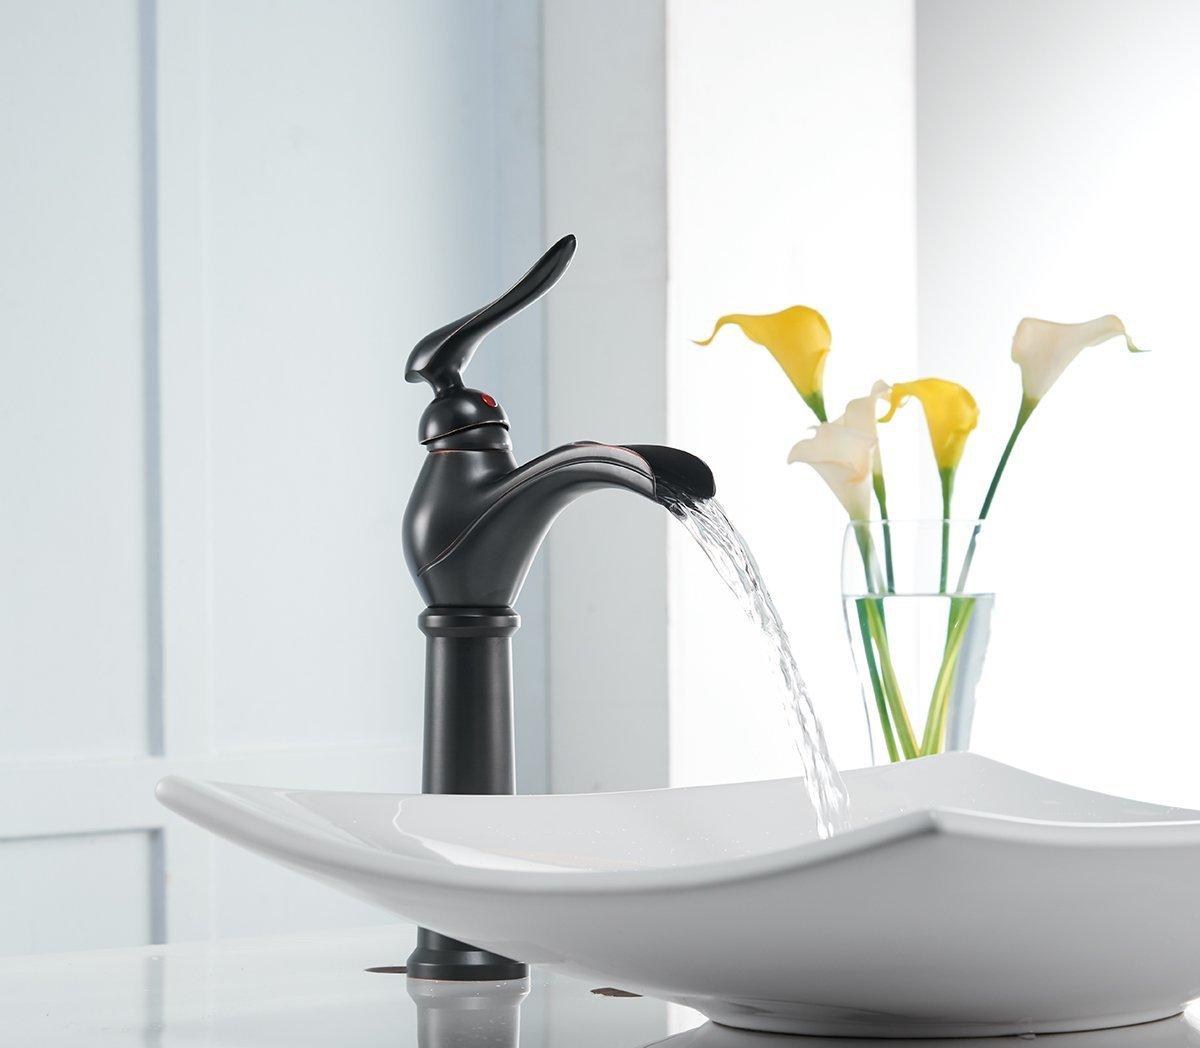 Greenspring Waterfall Single Lever Handle Hole Bathroom Sink Faucet Brushed Nickel